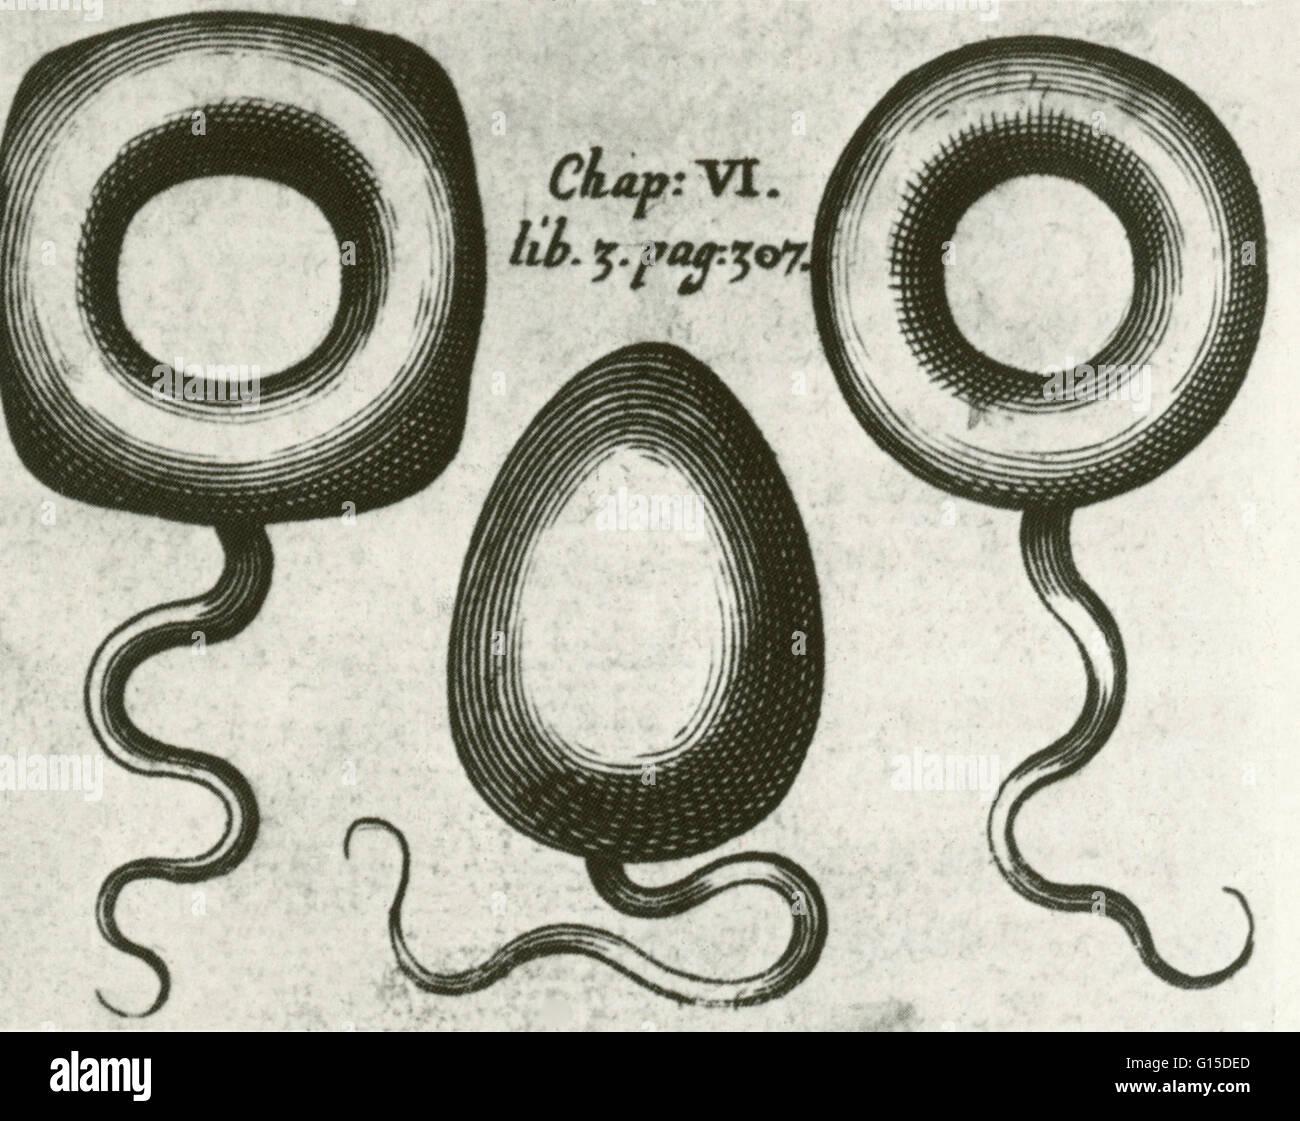 Prolapse Of The Uterus Stockfotos & Prolapse Of The Uterus Bilder ...